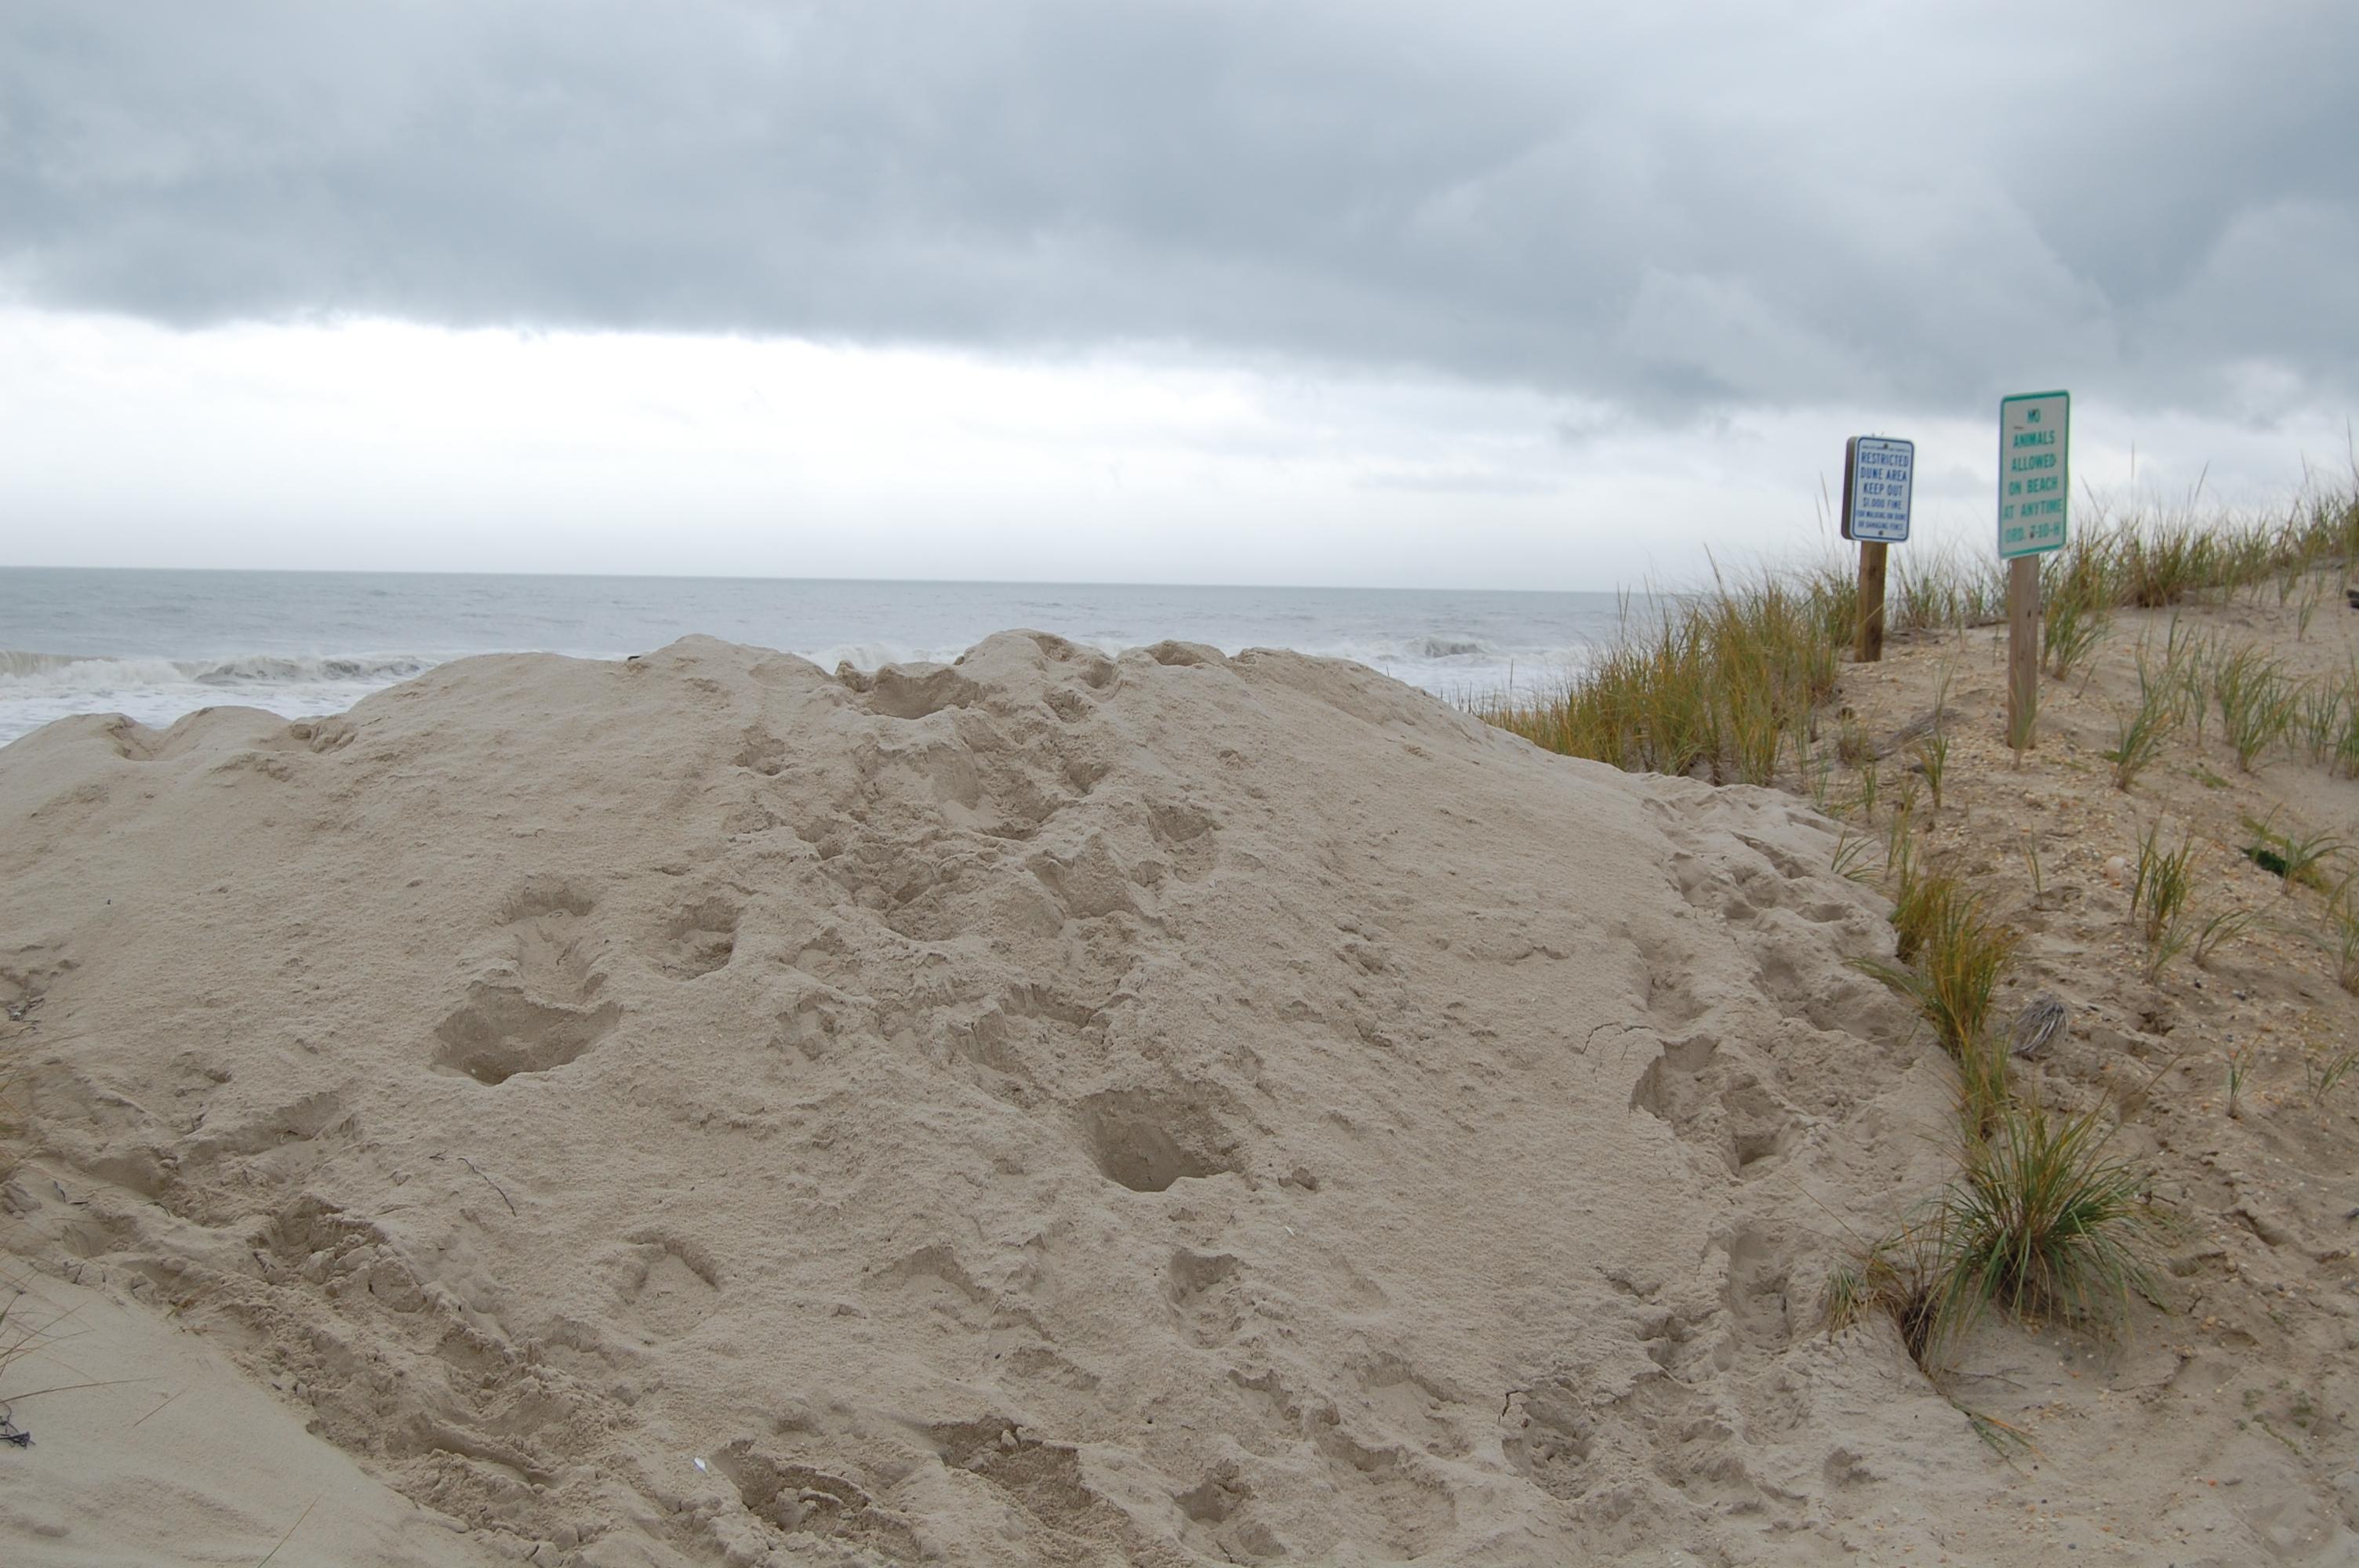 Beach entrances blocked off by a sand berm in Lavallette, Sept. 30, 2015. (Photo: Daniel Nee)